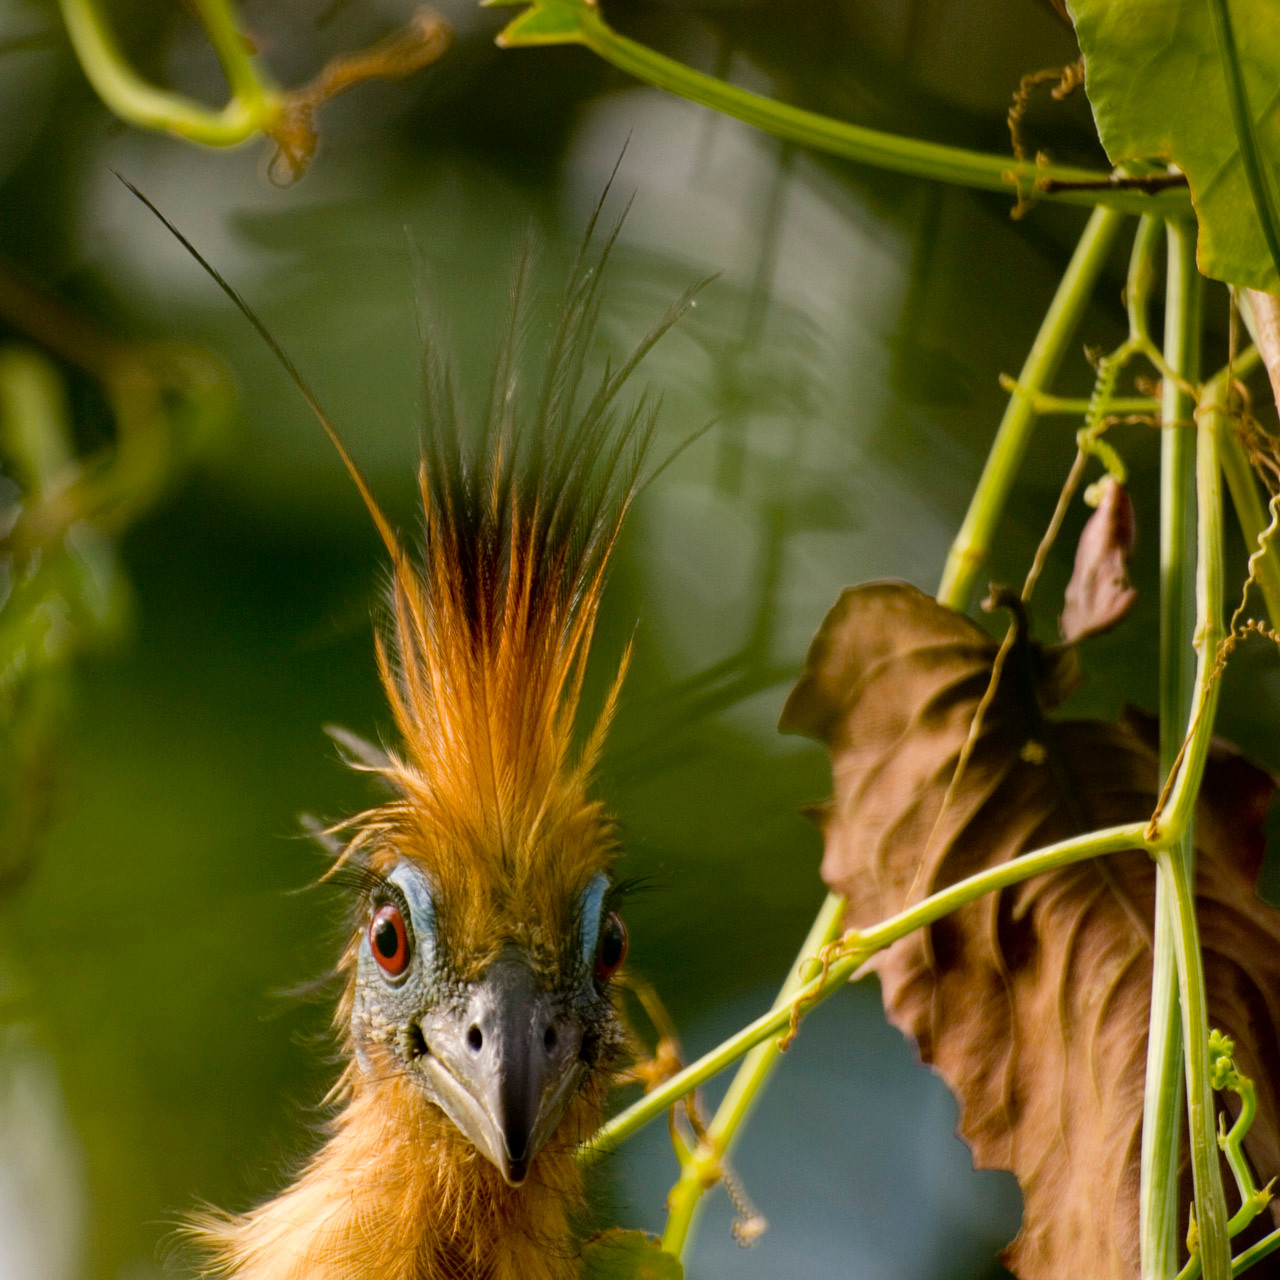 Hoatzin (Opisthocomus hoazin), also known as the Stinkbird [Venezuela, 2009]